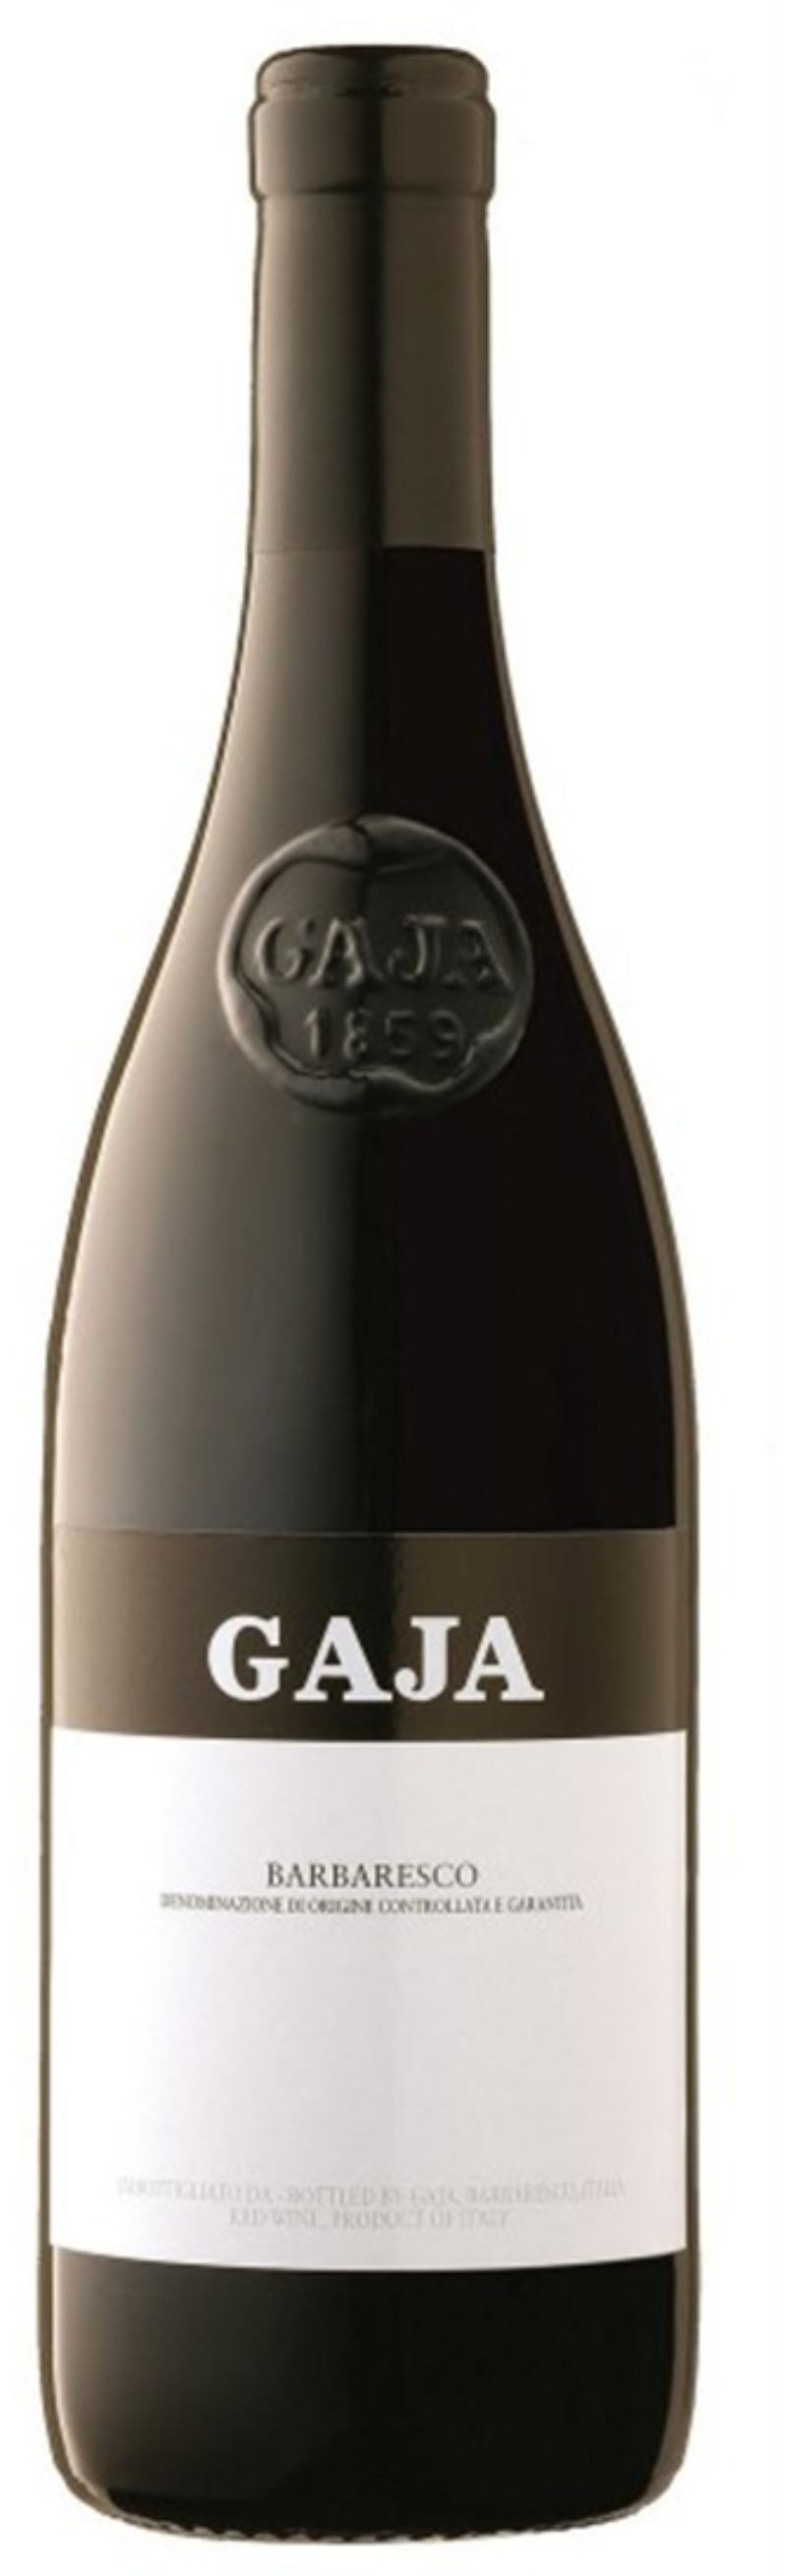 BARBARESCO-DOCG-GAJA-1999